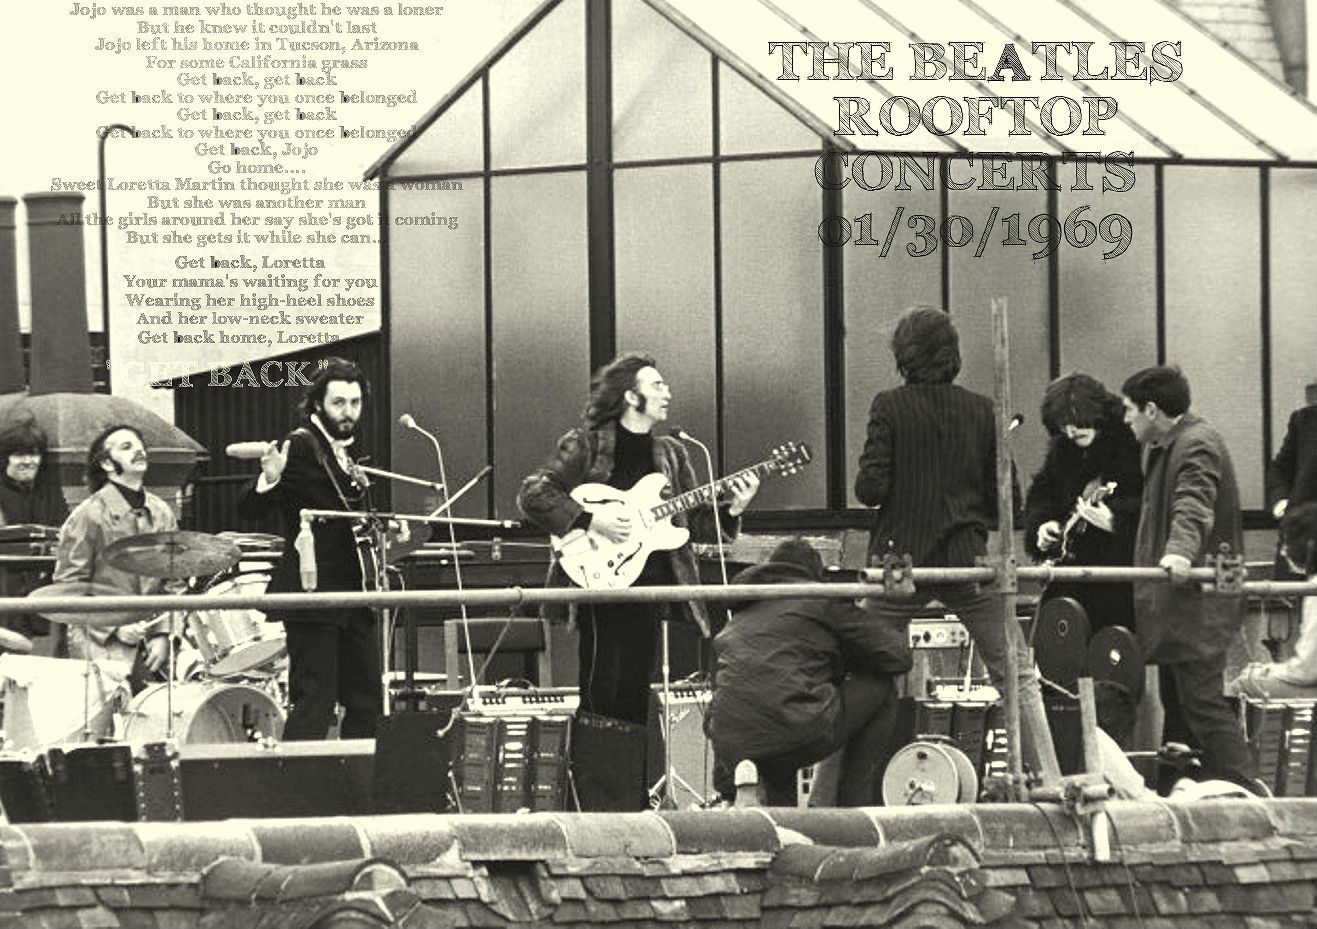 THE BEATLES ROOFTOP CONCERT 01/30/1969 | Beatles, Mitos ...